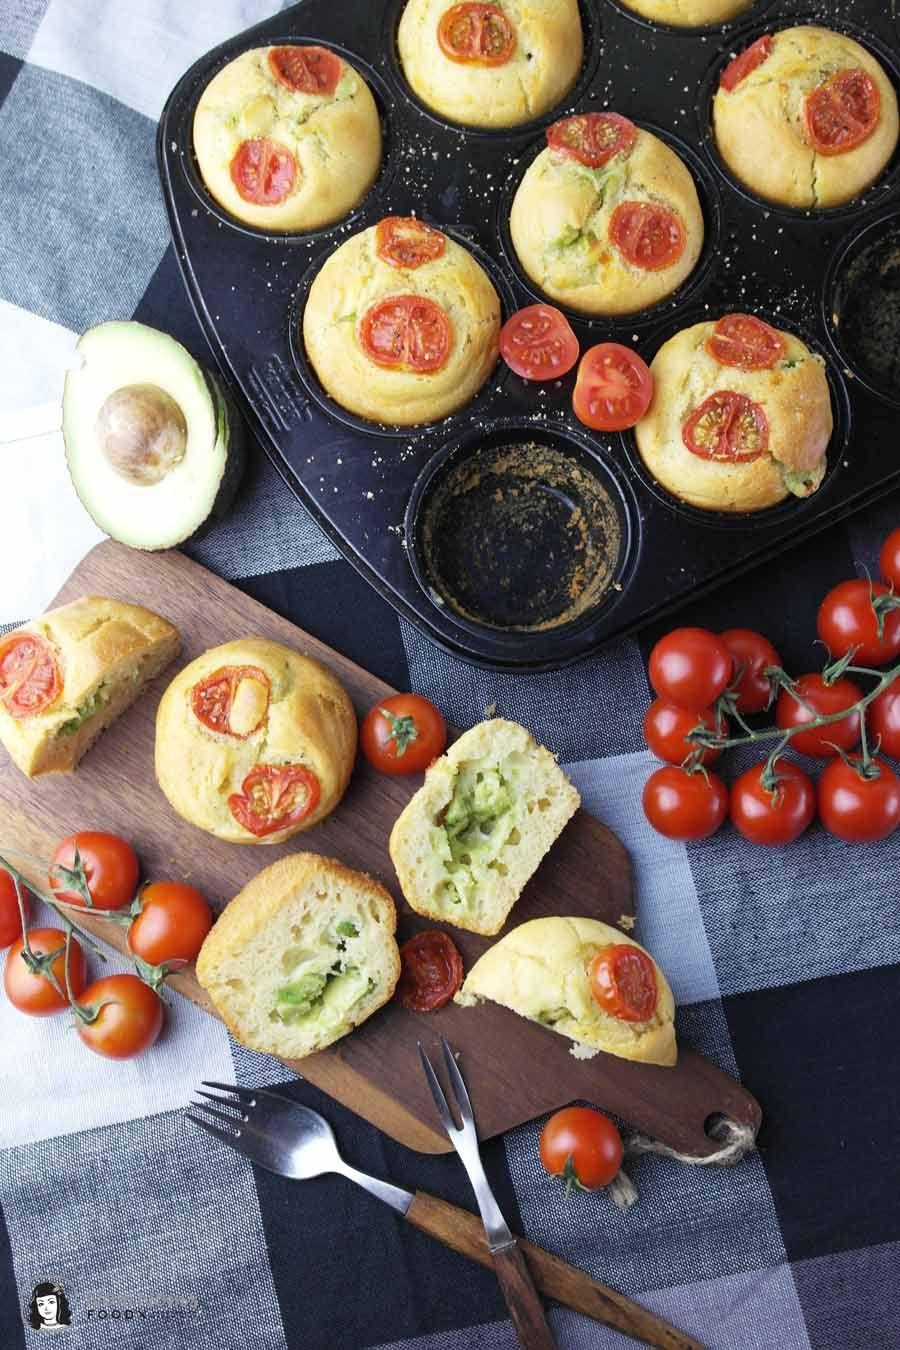 Perfekter Snack: Muffins mit Avocado-Käse-Füllung | Rezept ...